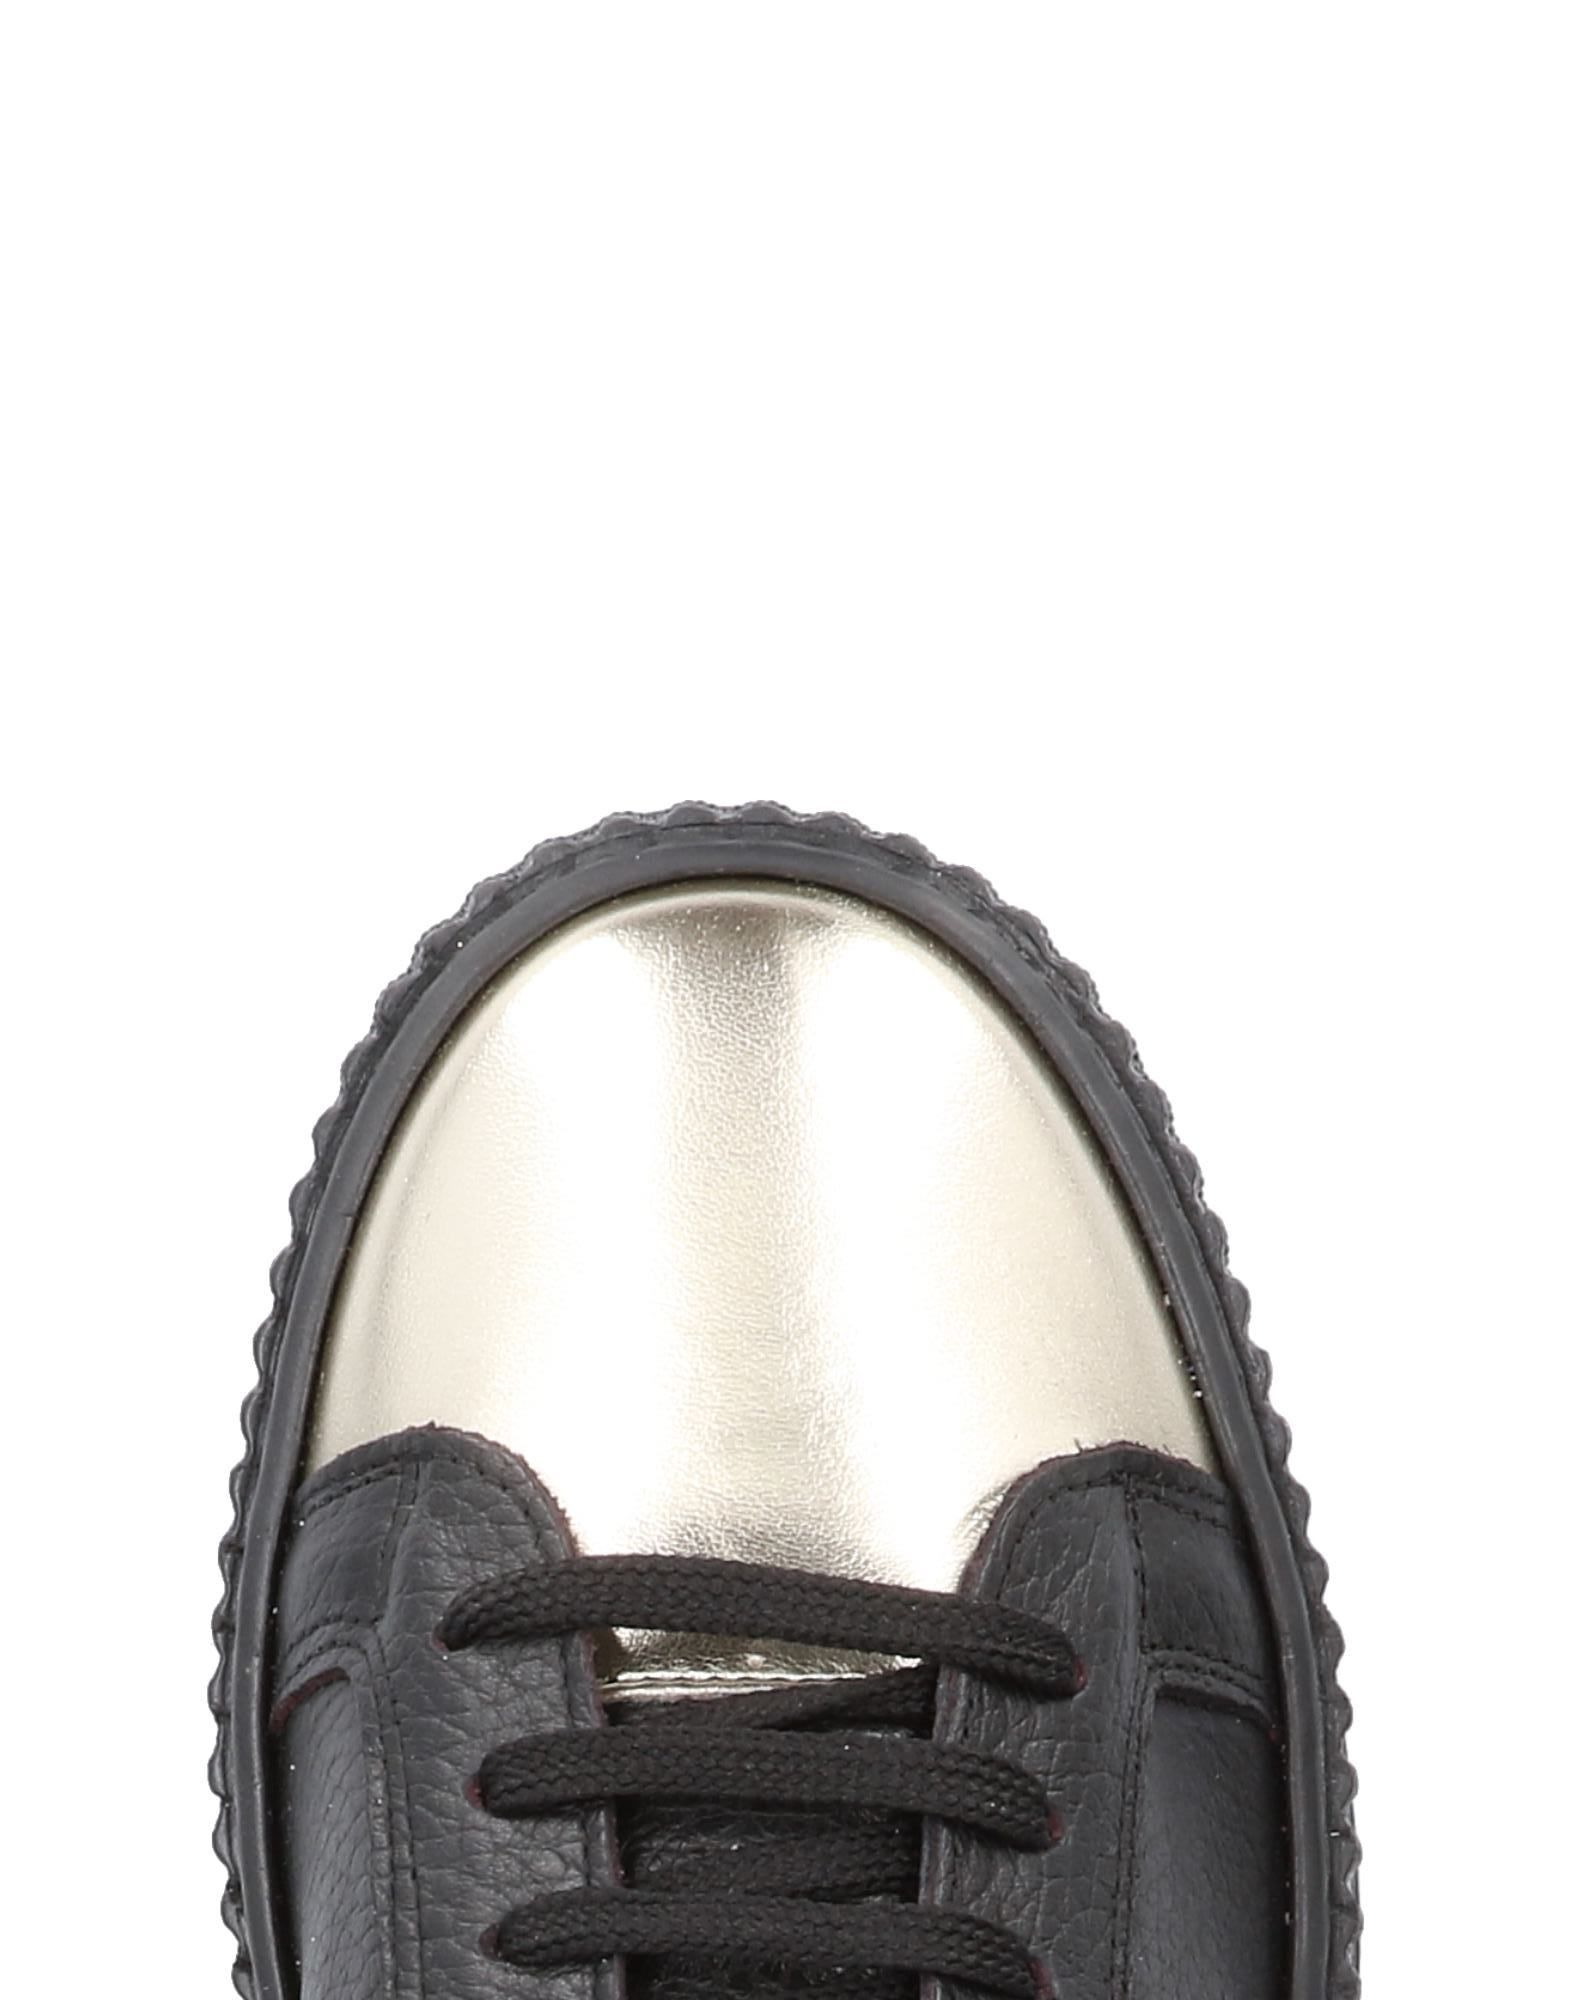 Ovye' By Cristina 11456615EI Lucchi Sneakers Damen  11456615EI Cristina Gute Qualität beliebte Schuhe adebc3